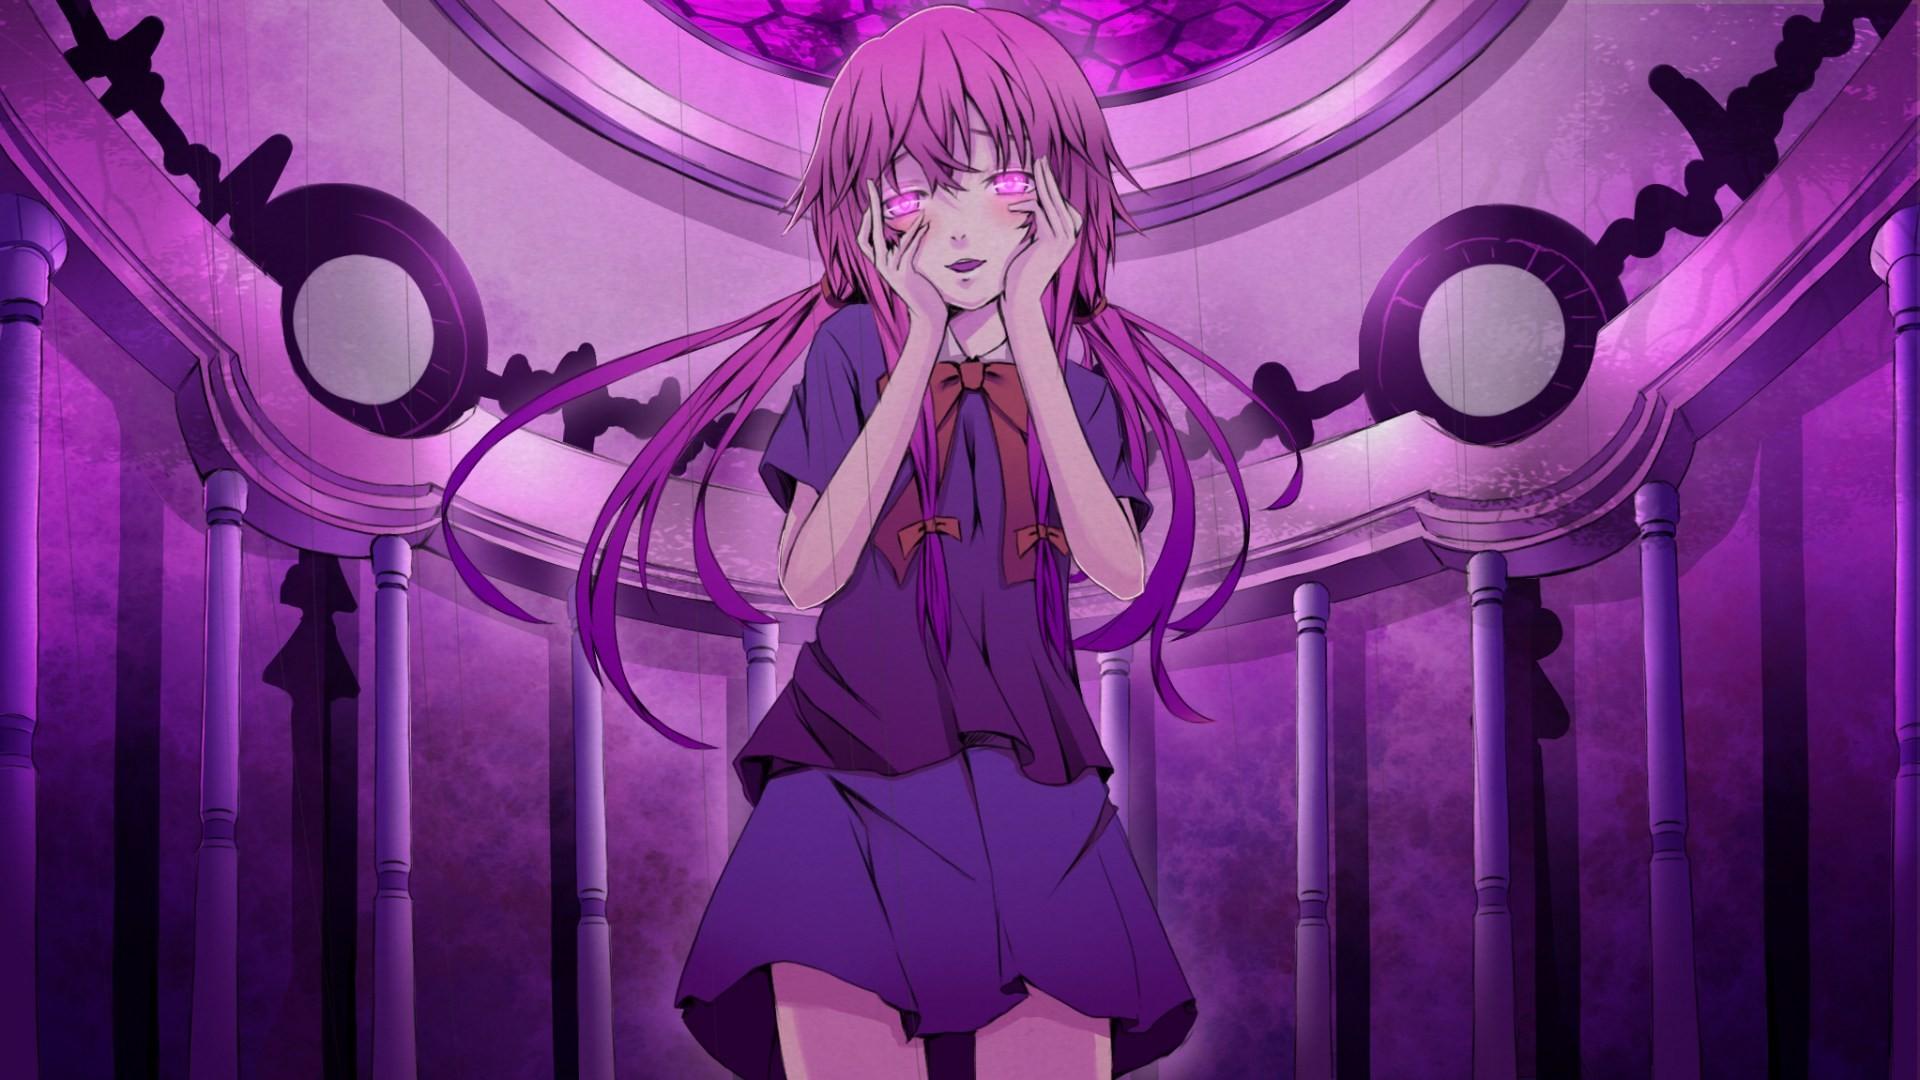 Mirai Nikki Gasai Yuno Yandere Anime Anime Girls: Wallpaper : Illustration, Anime Girls, Mirai Nikki, Gasai